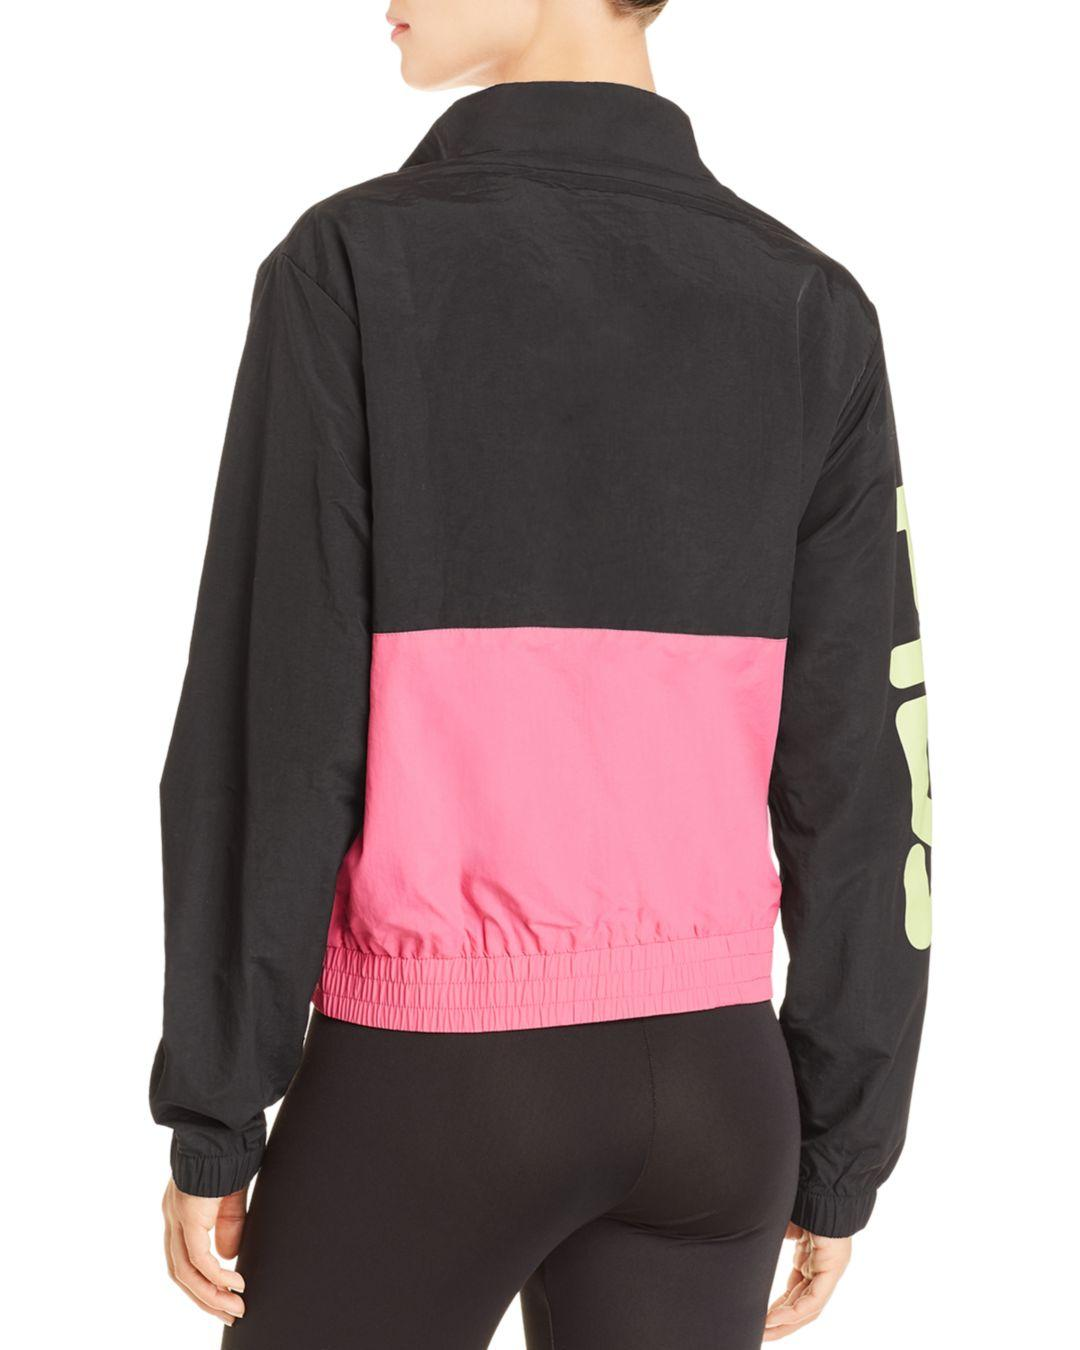 788b361963fe Lyst - Fila Miguela Track Jacket - Womens S in Black